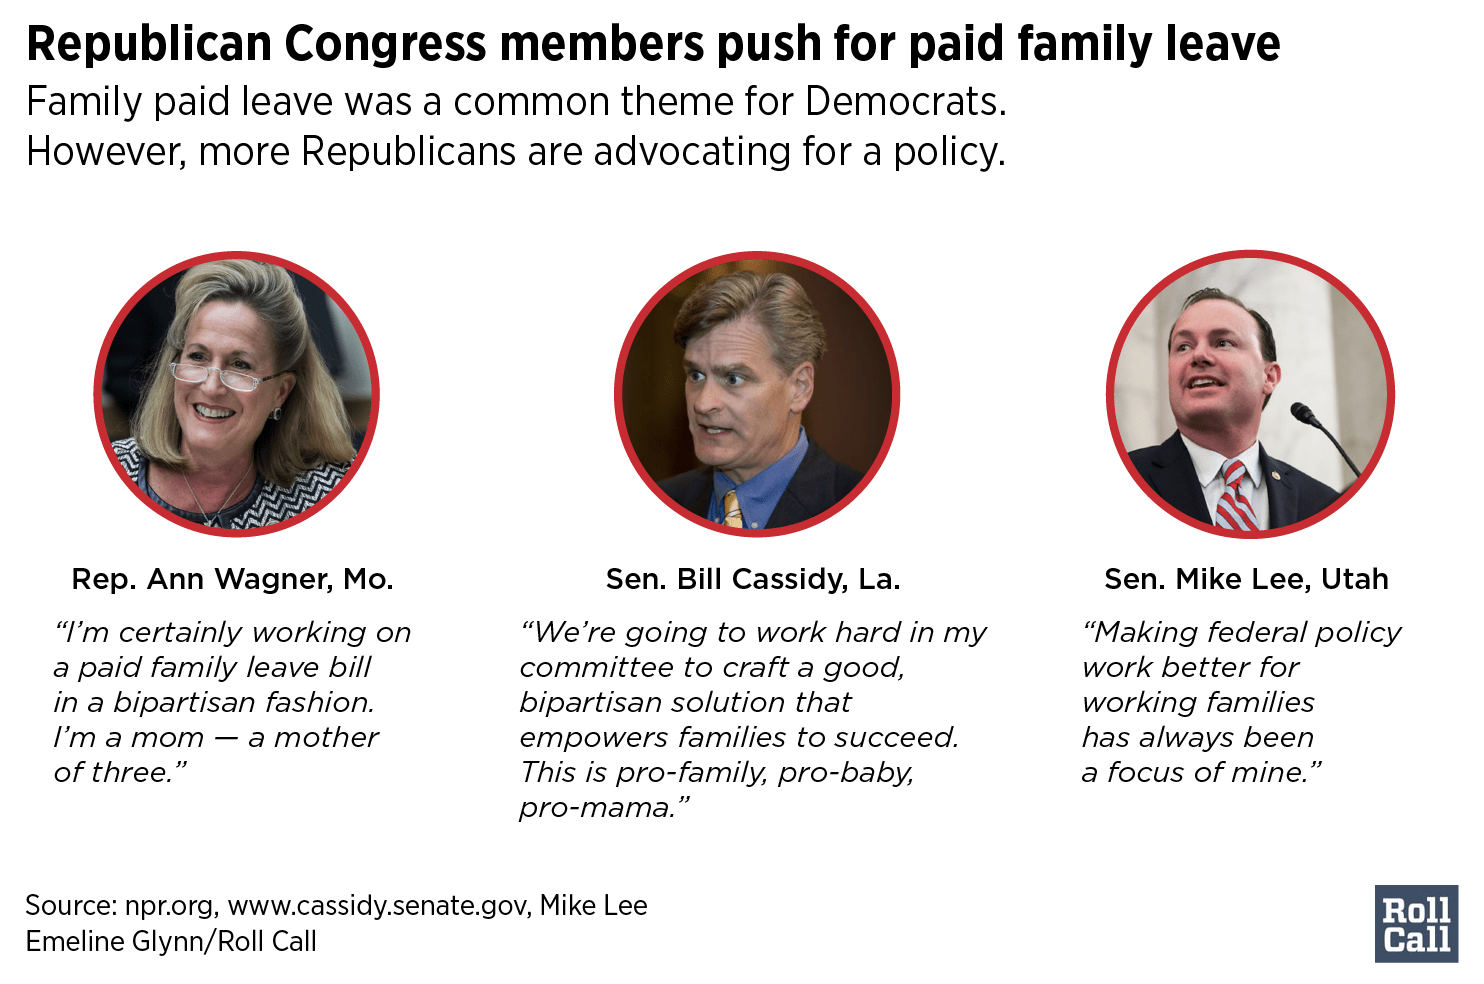 paid_family_leave-v4